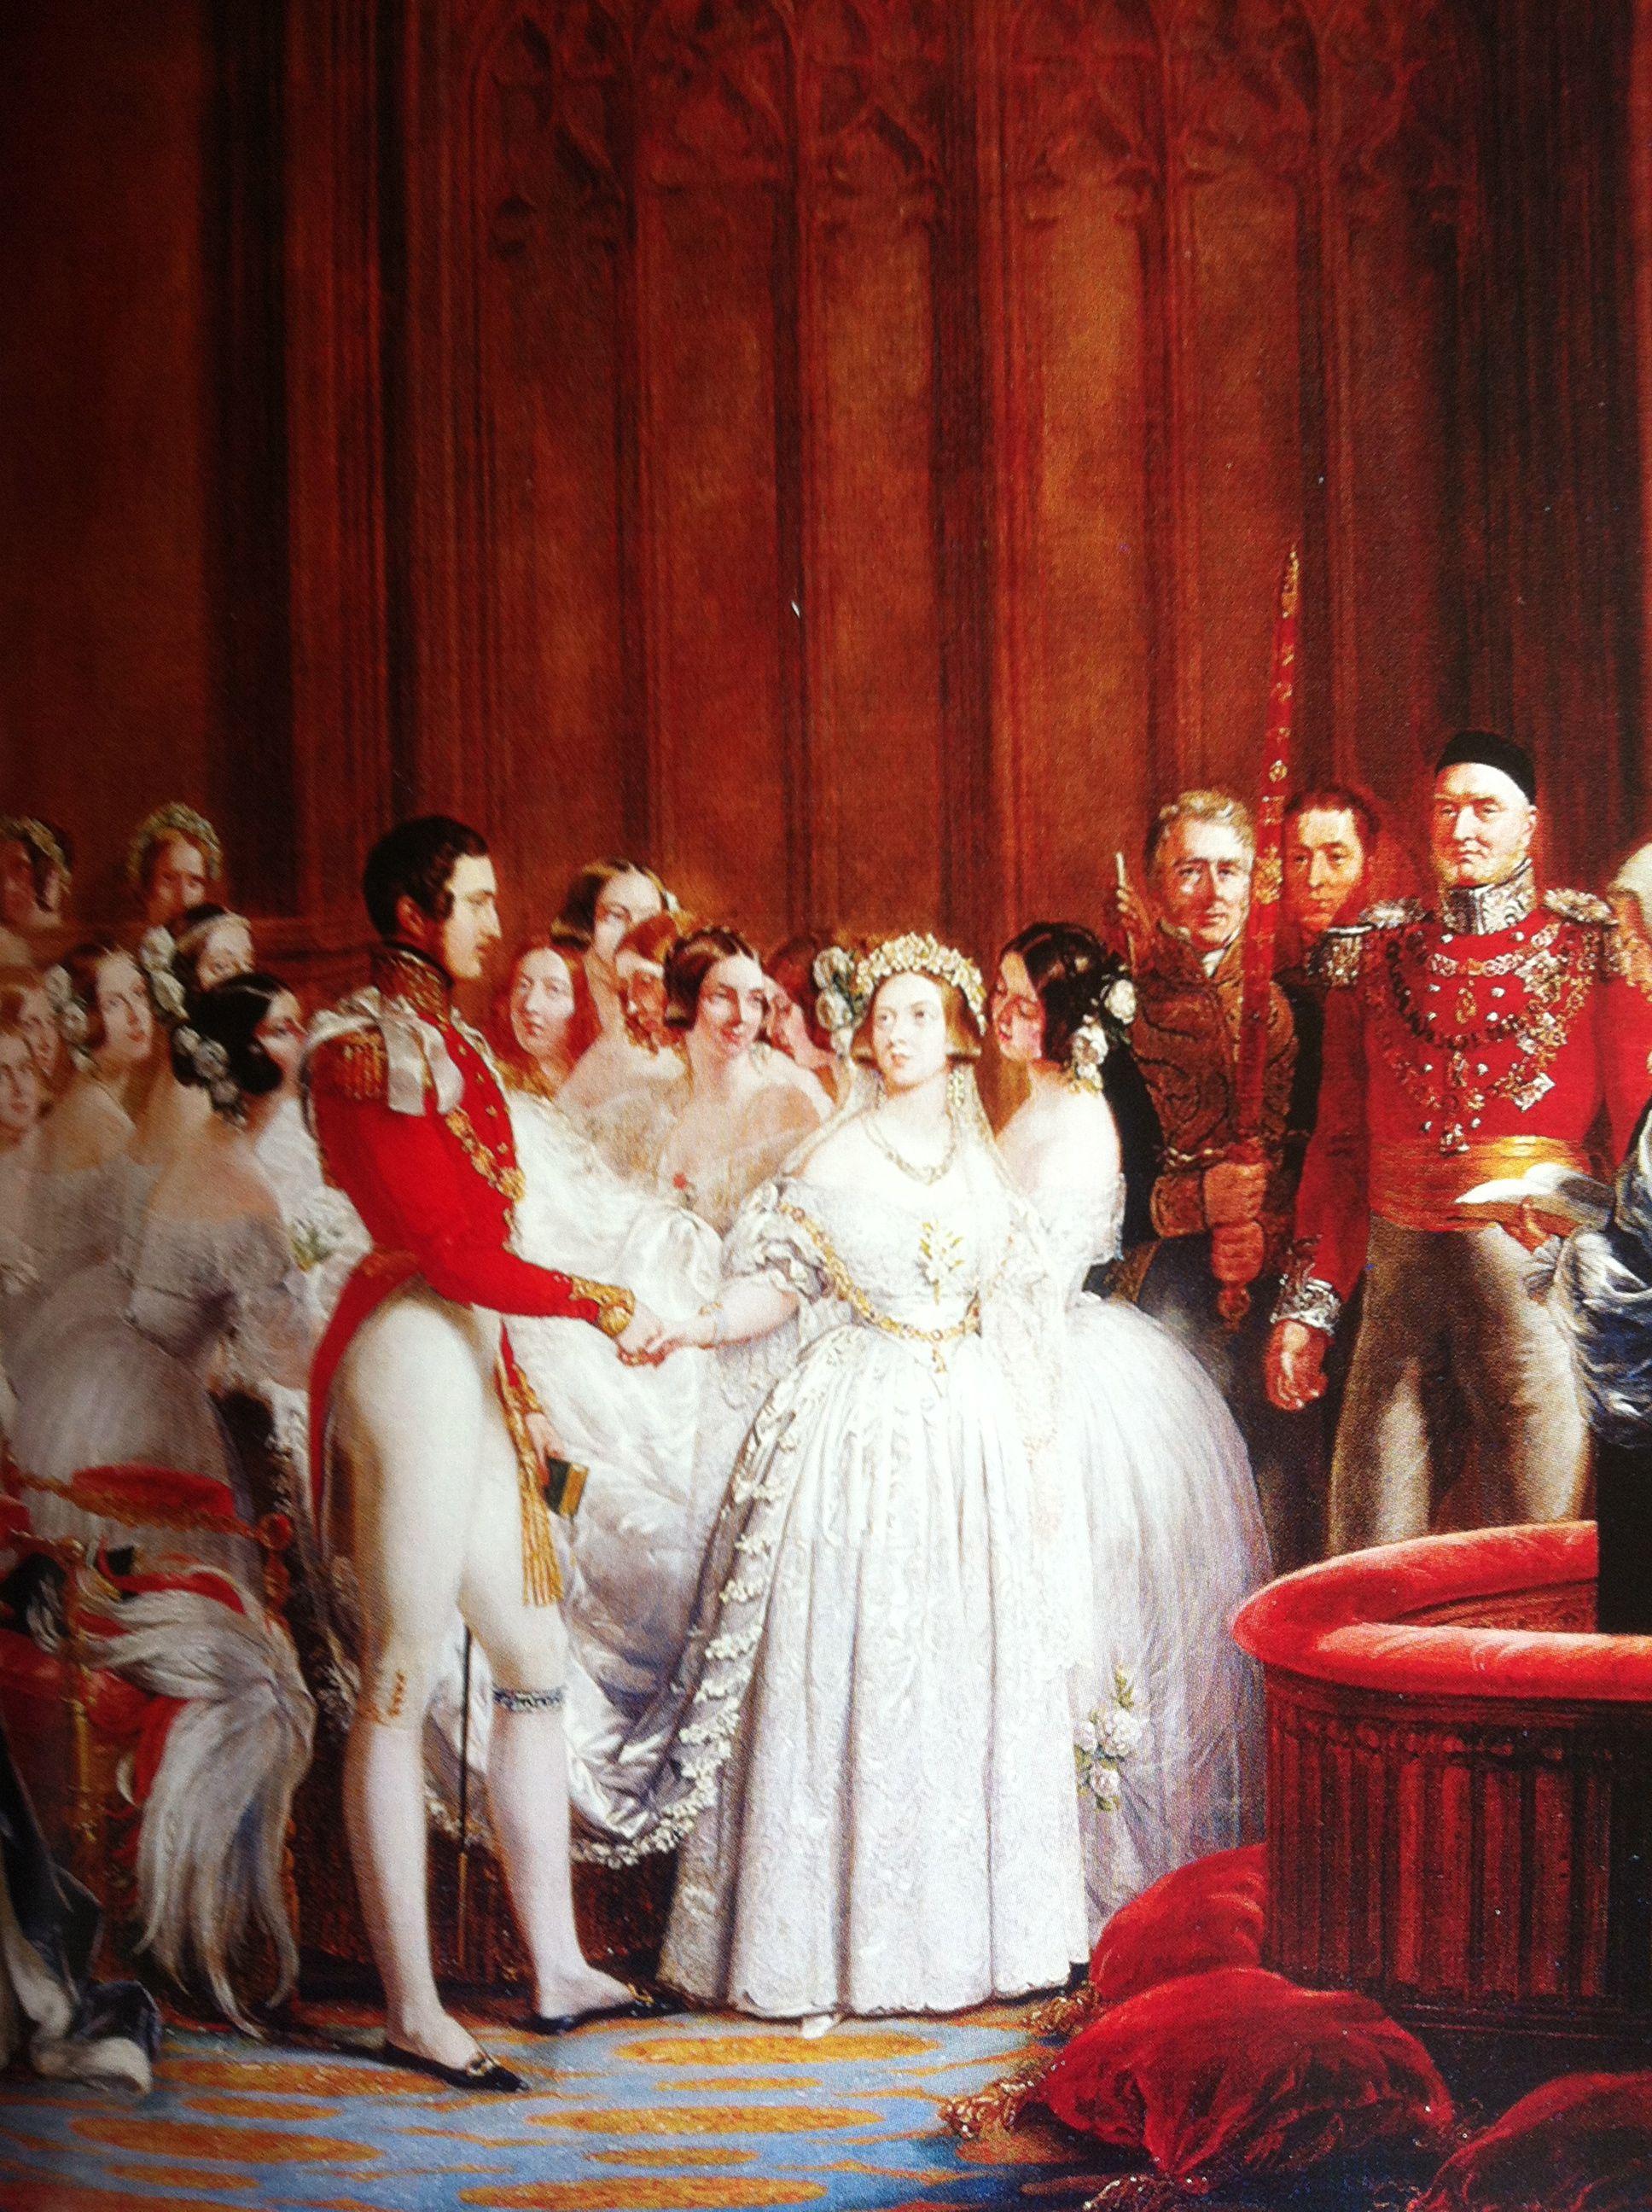 Queen Victoria Wedding 1840 Victoria Bruidsparen Bruid